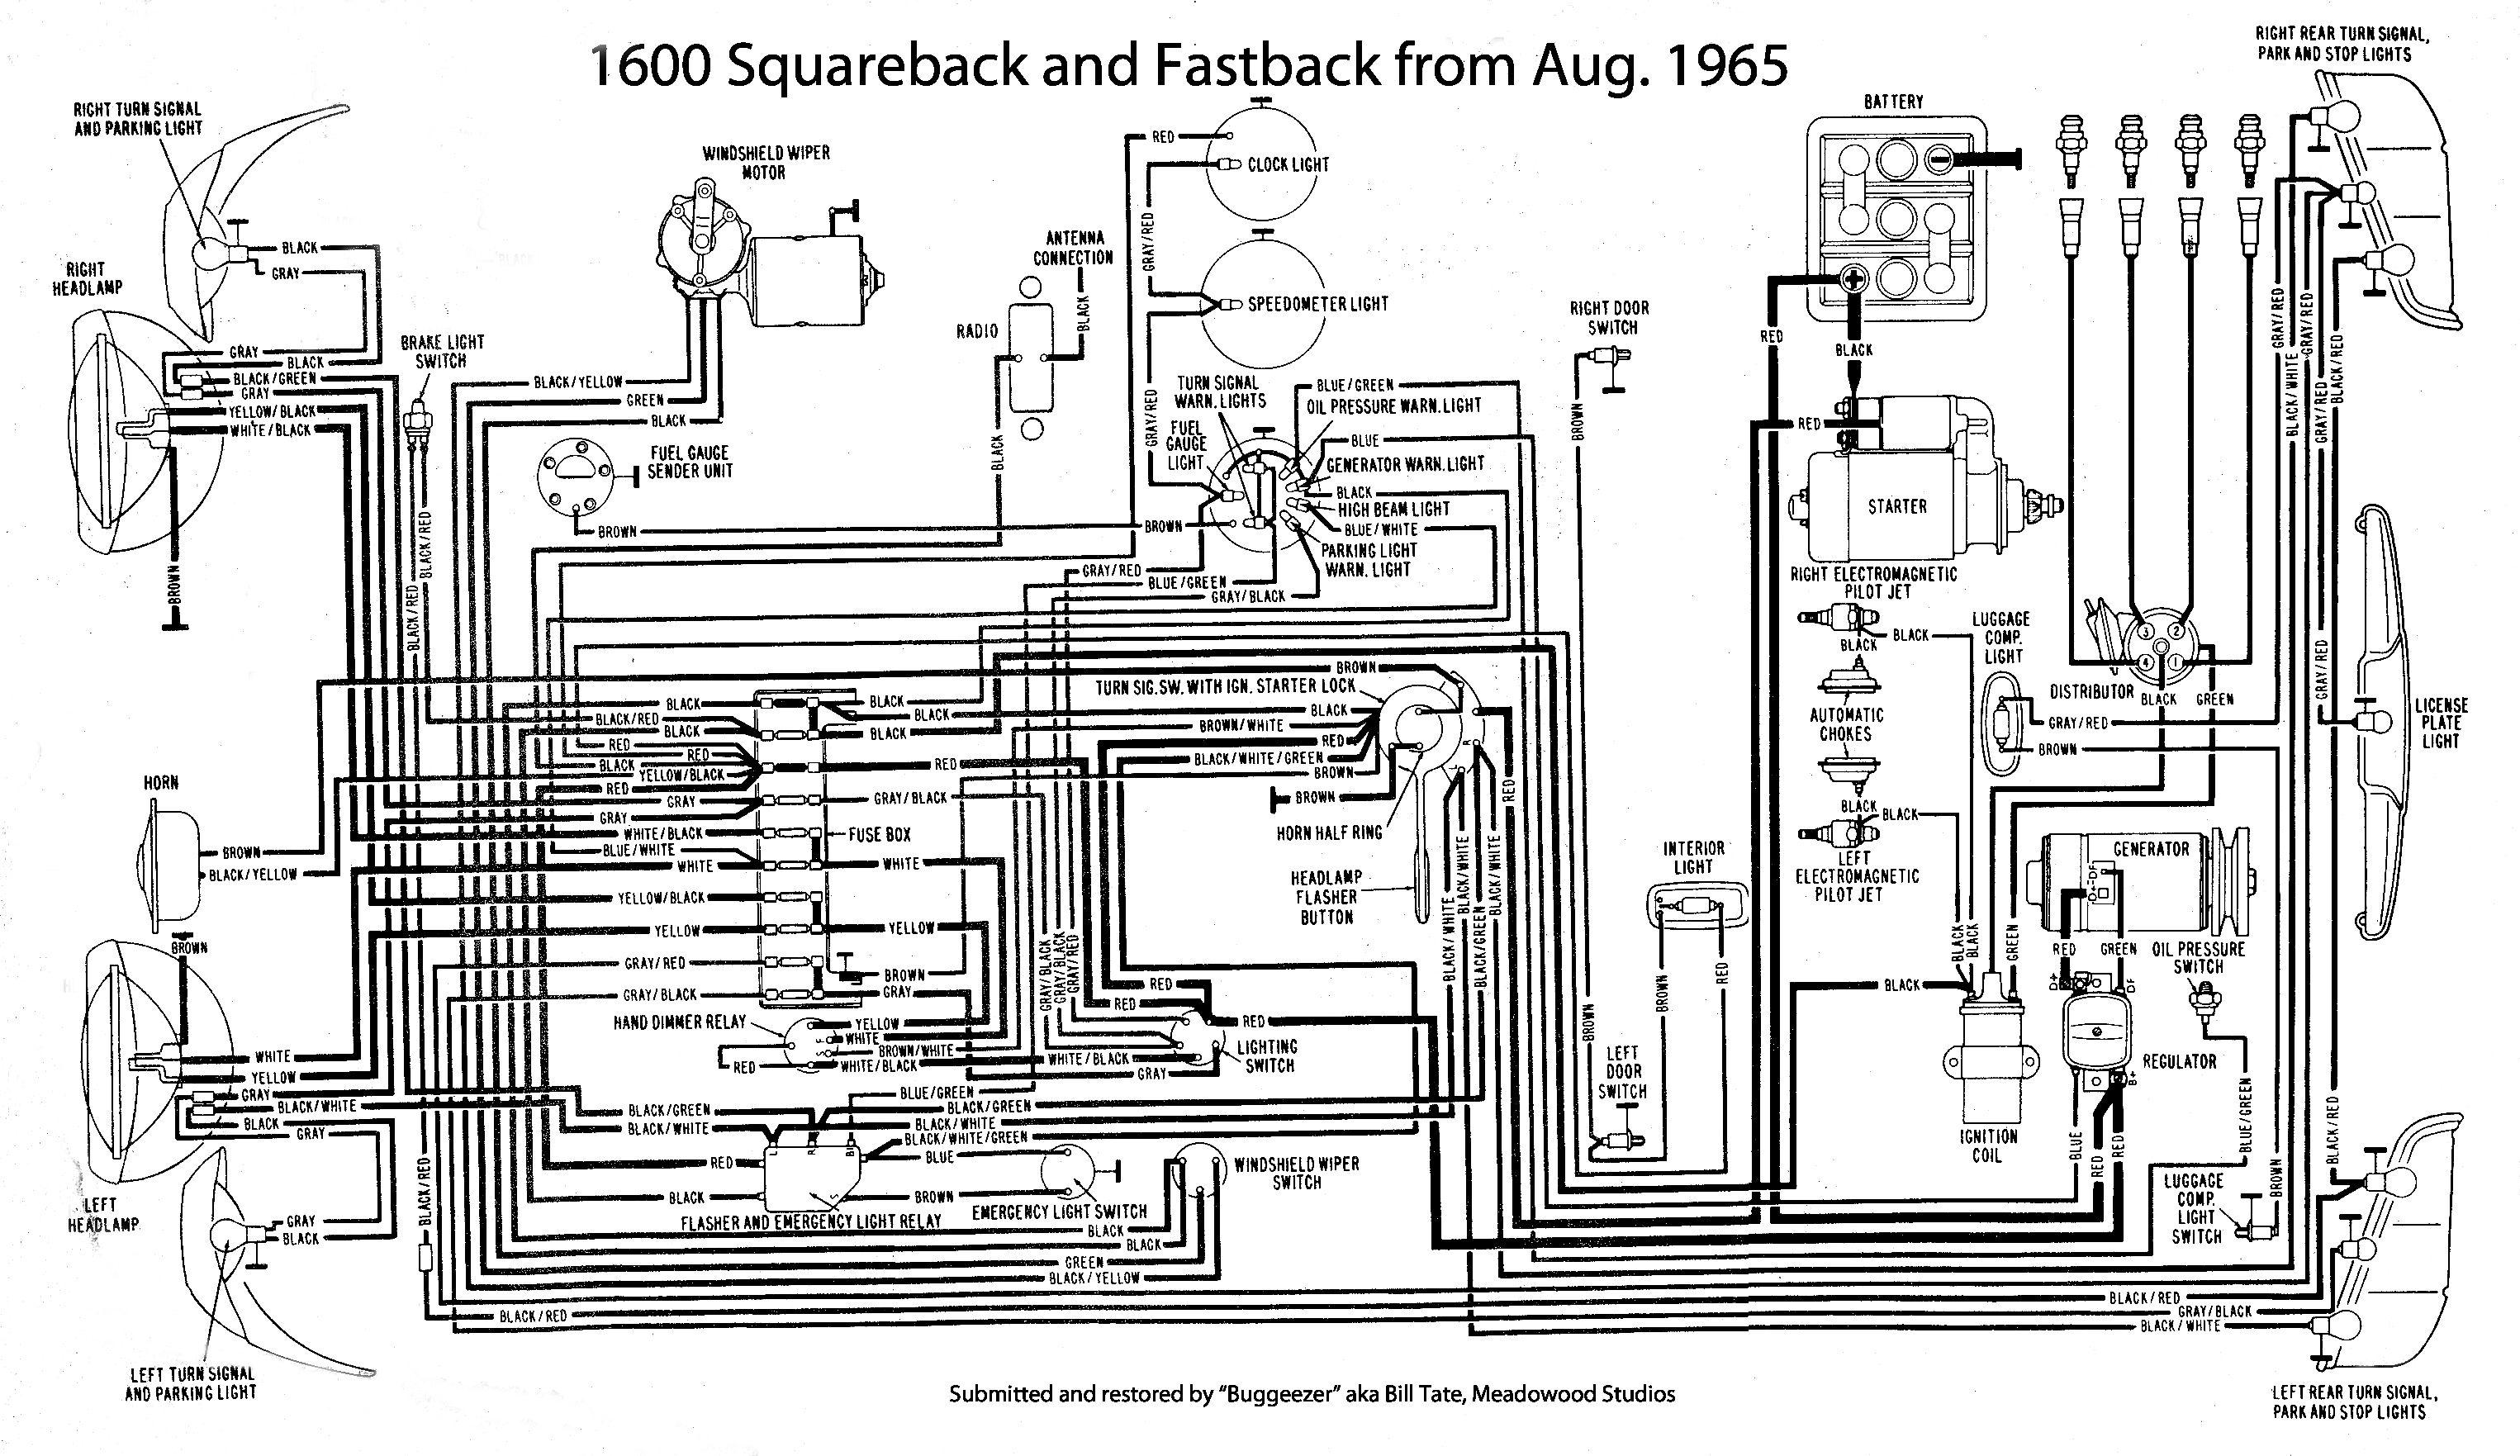 1971 vw tle fastback google search type 3s pinterest 1971 vw tle fastback google search sciox Gallery